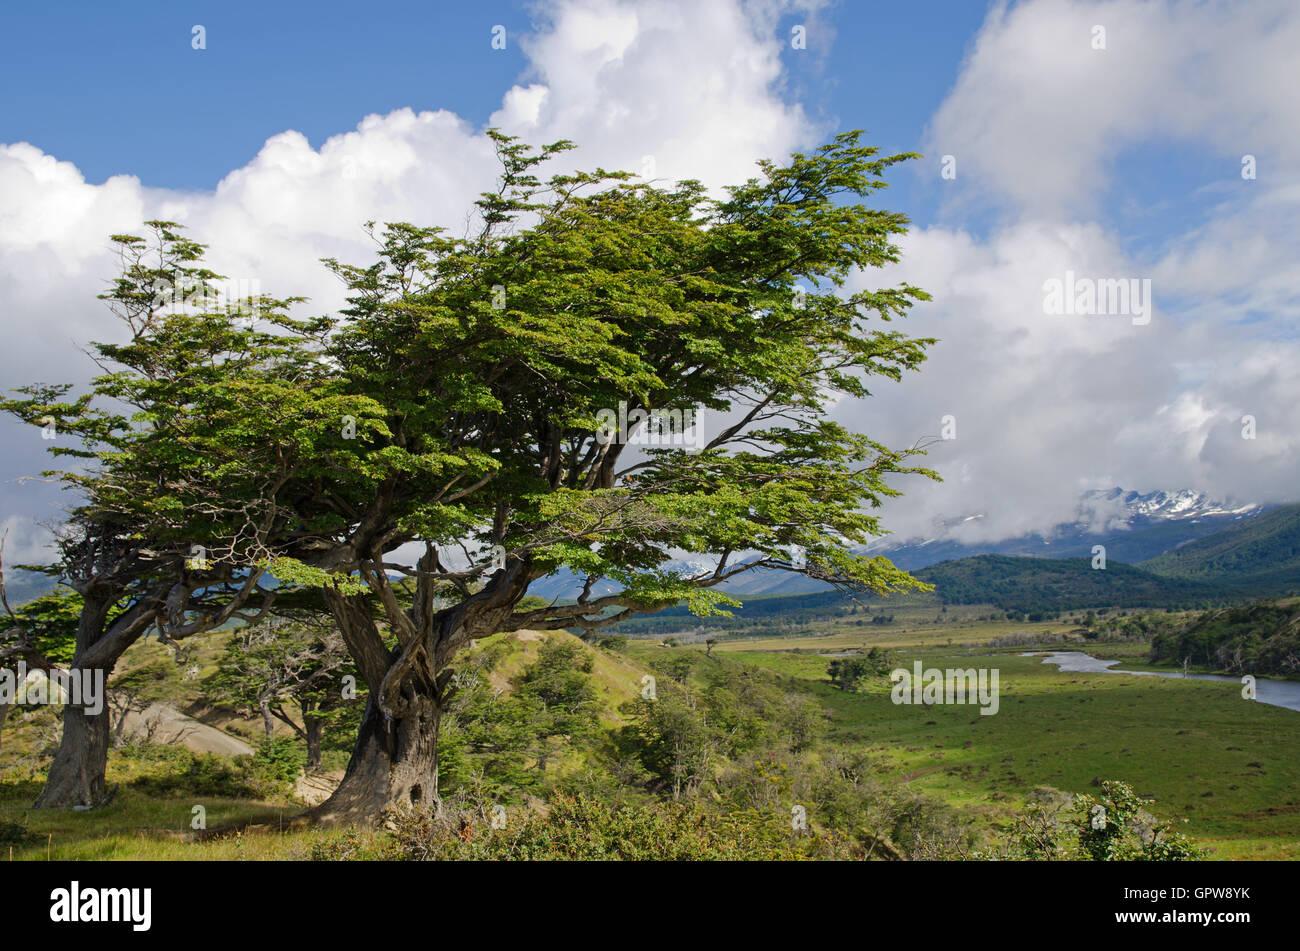 Wind-bent trees in Fireland (Tierra Del Fuego), Patagonia, Argen - Stock Image